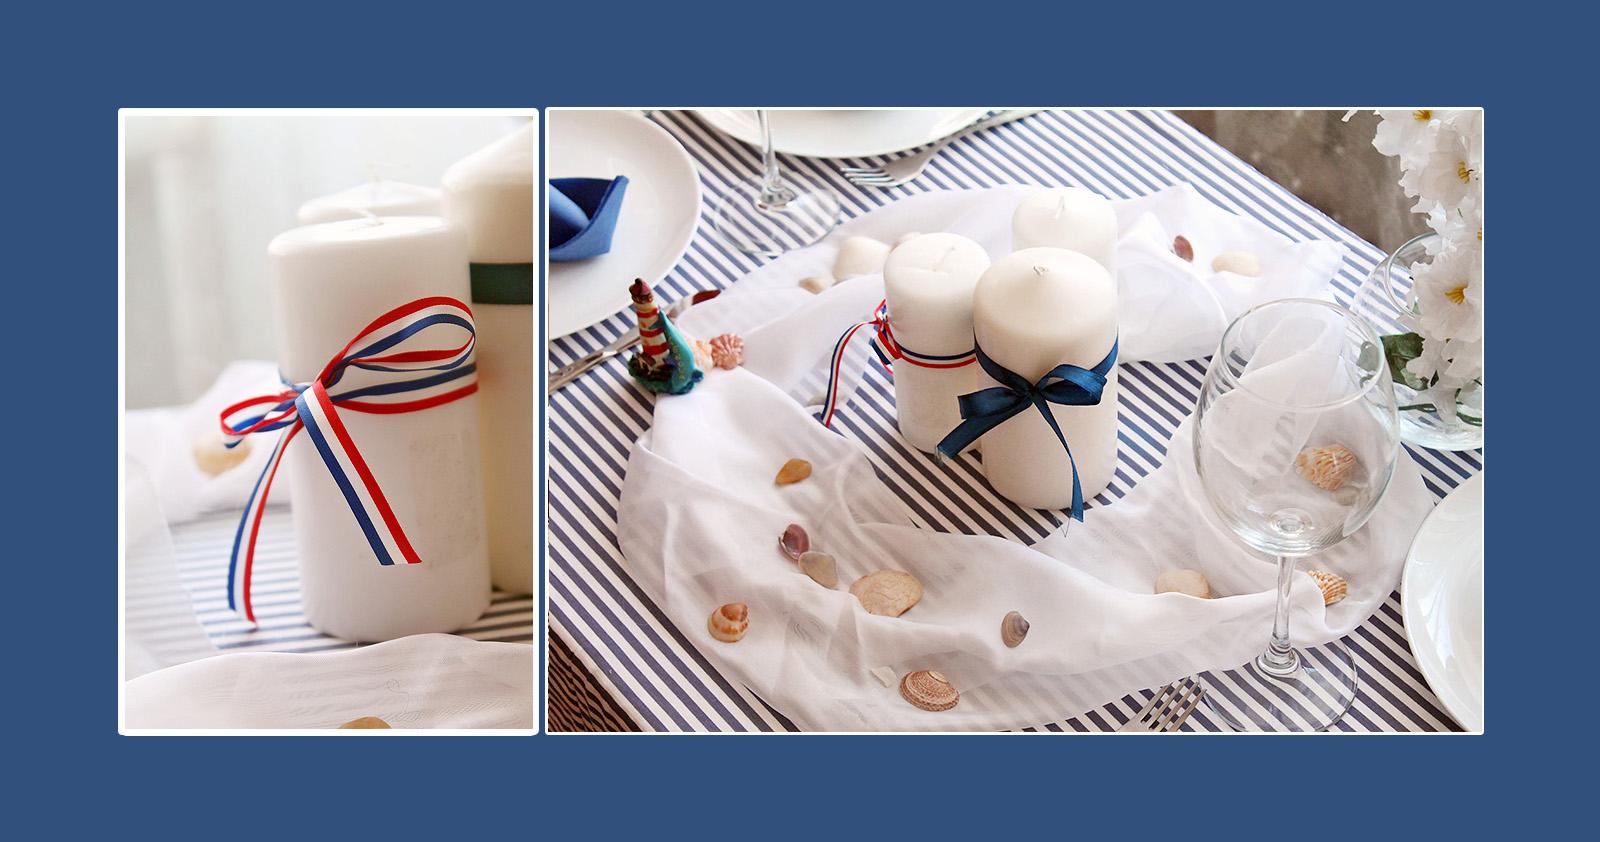 Tischdeko Konfirmation Kerzen